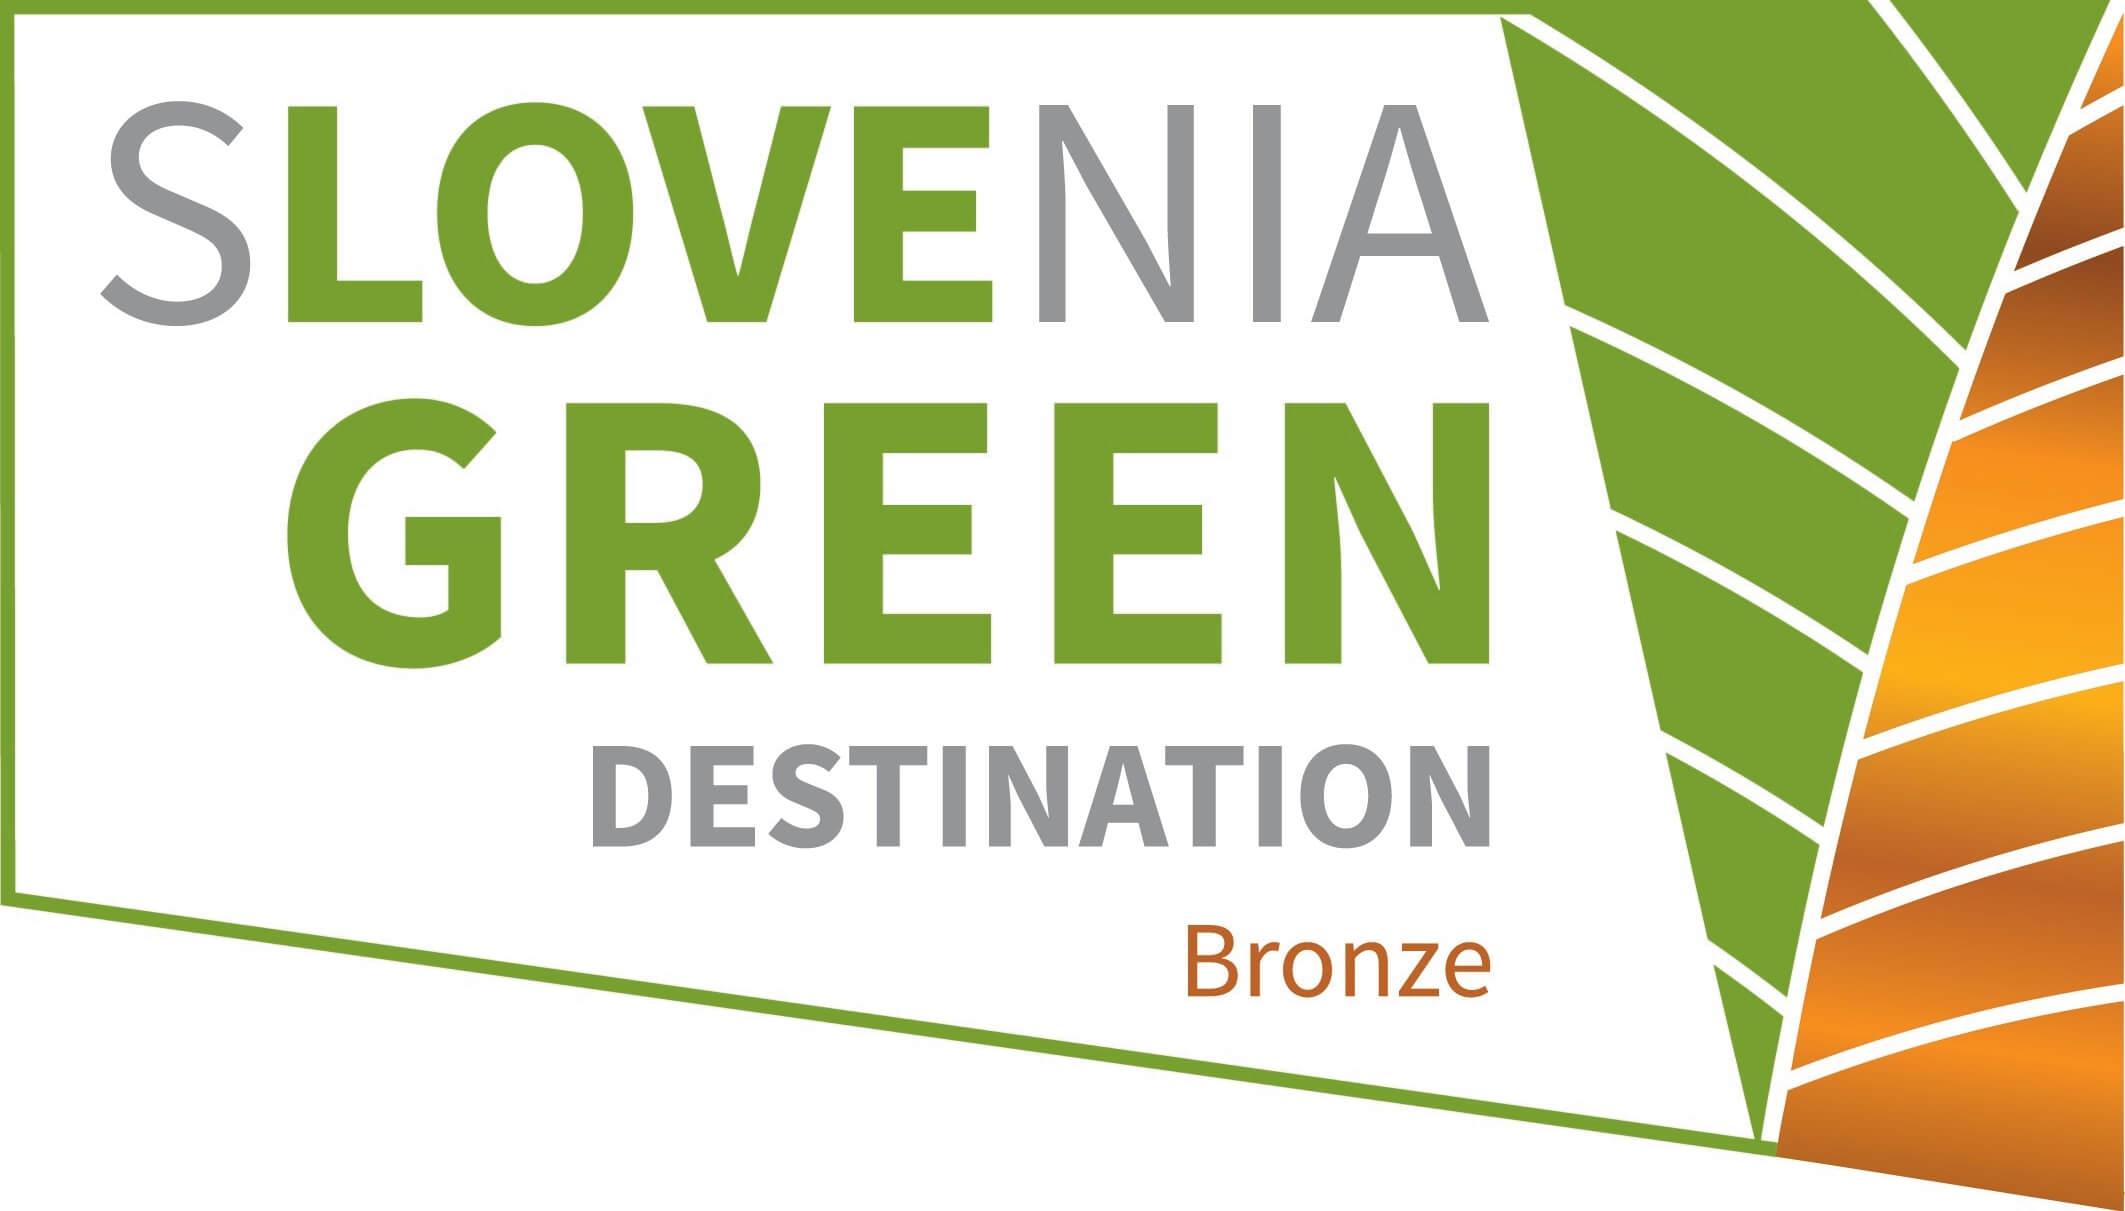 slovenia-green-bronze